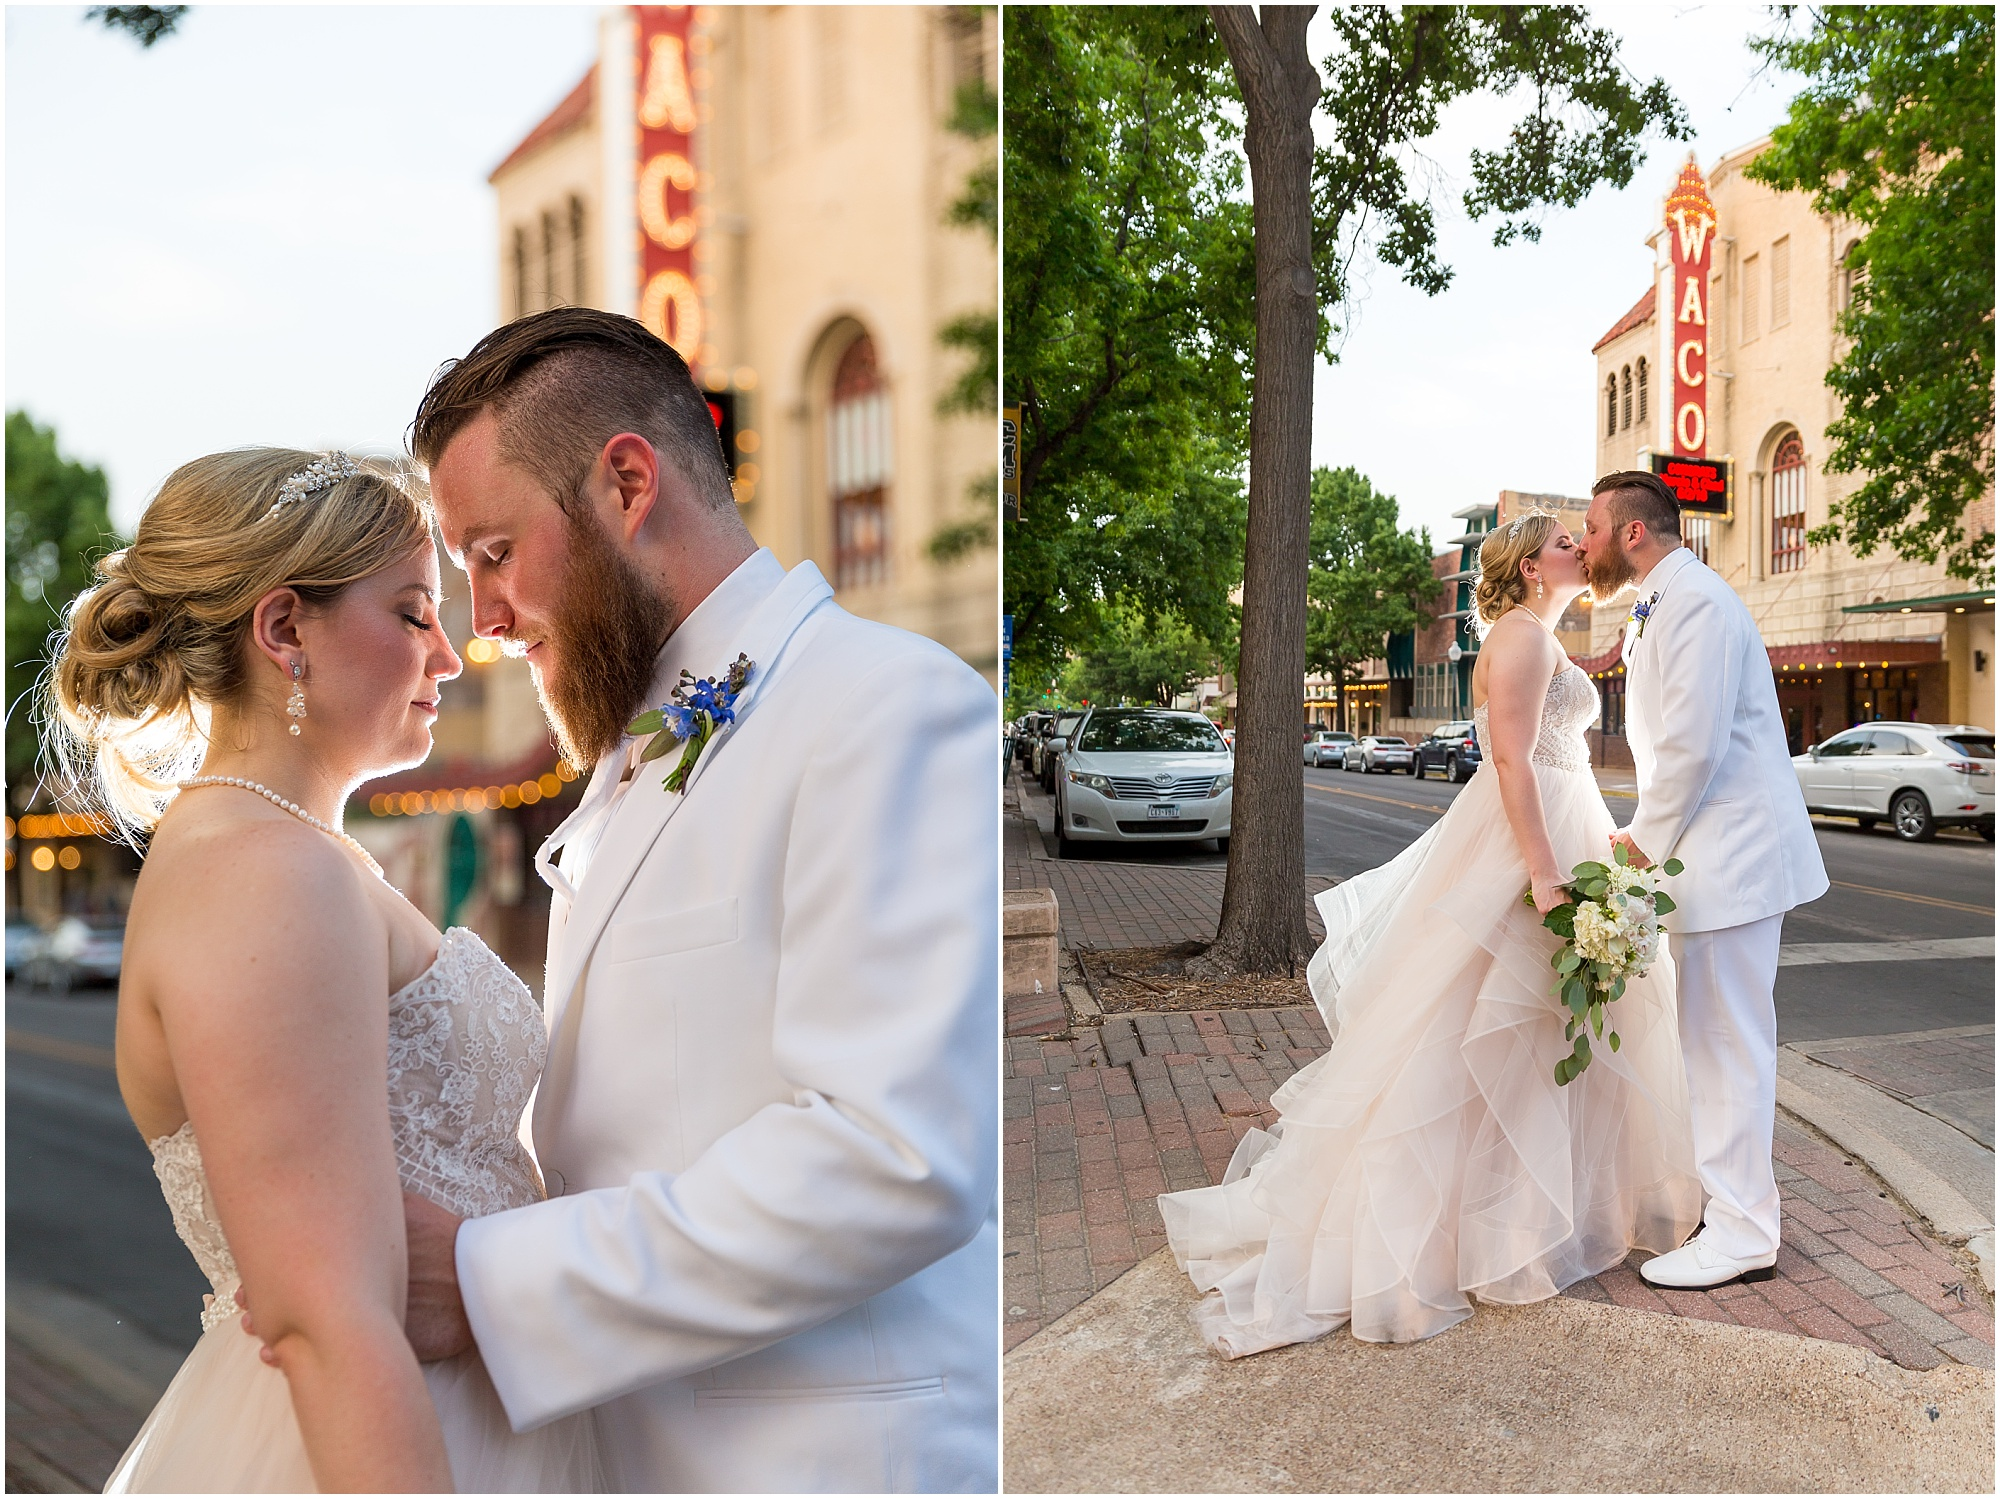 Bride and groom pose downtown near Waco Hippodrome during their warehouse wedding in Waco, TX - www.jasonandmelaina.com